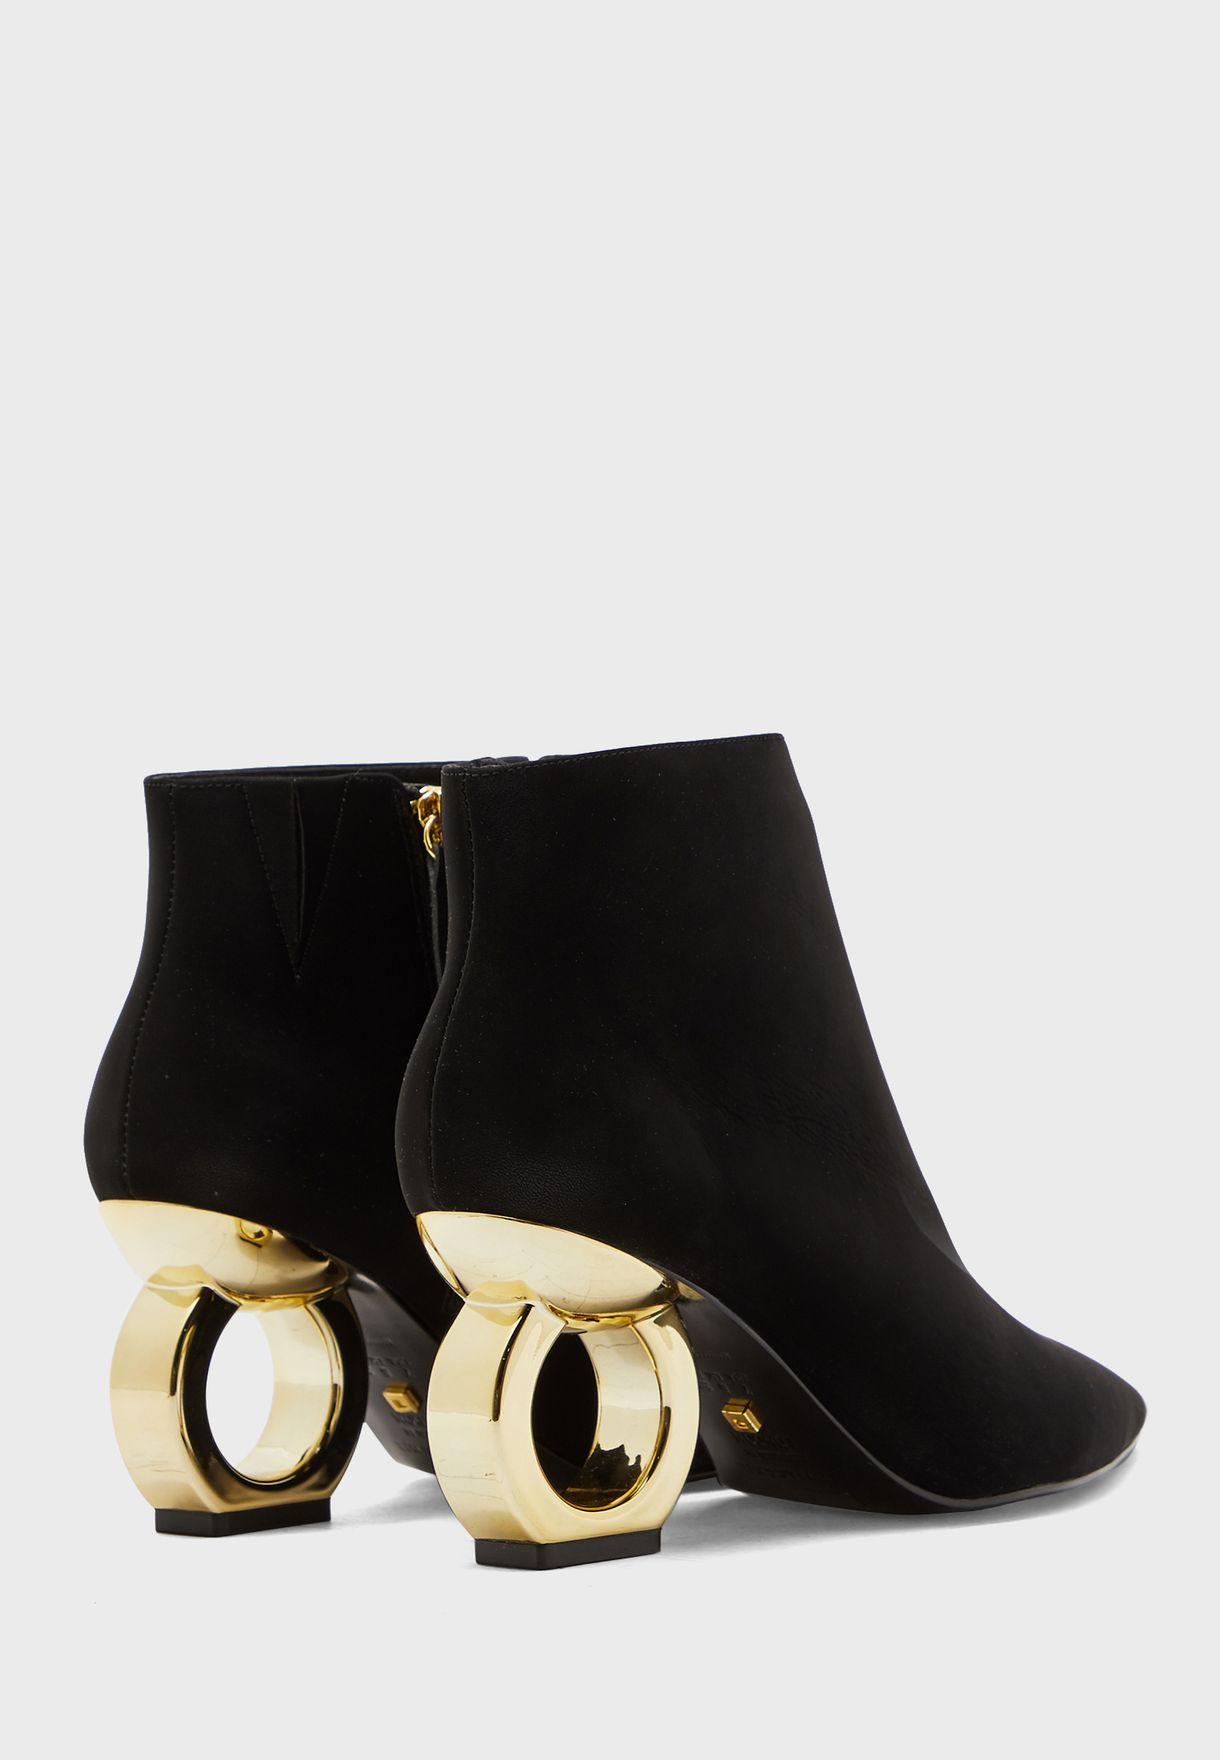 Alba High Heel Abkle Boot